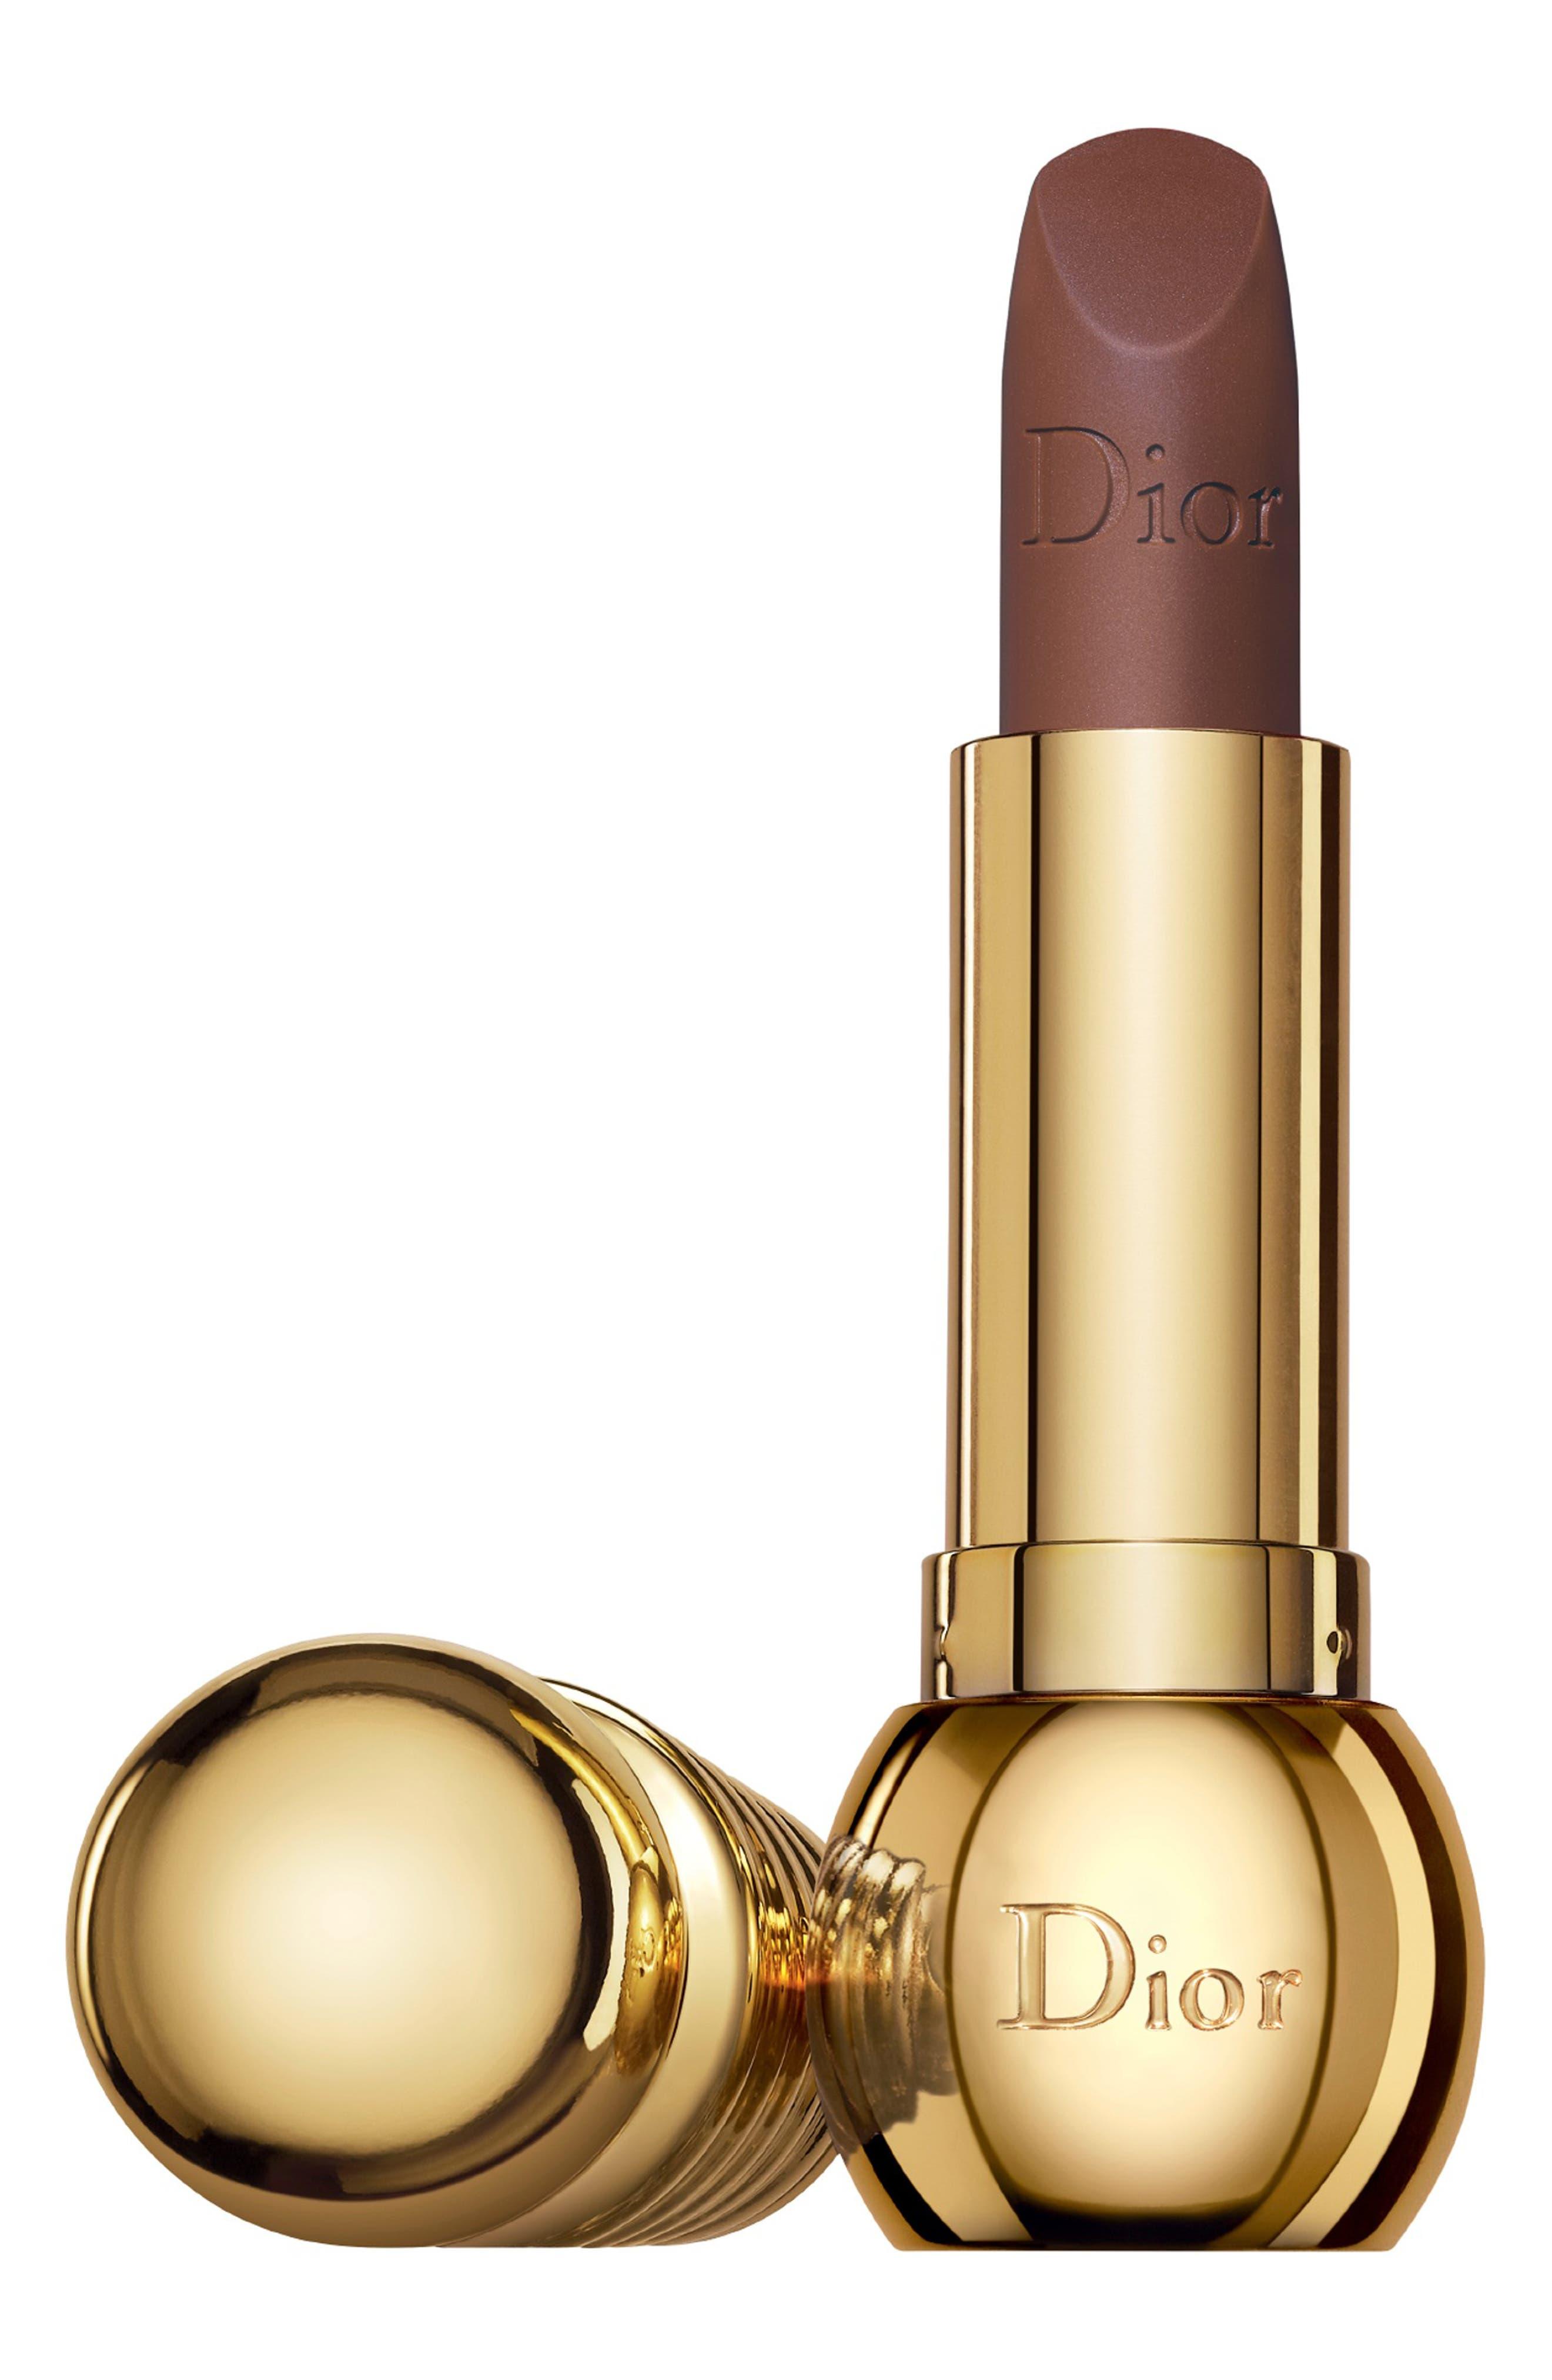 Dior Diorific Matte Velvet Color Lipstick - 620 Stunning